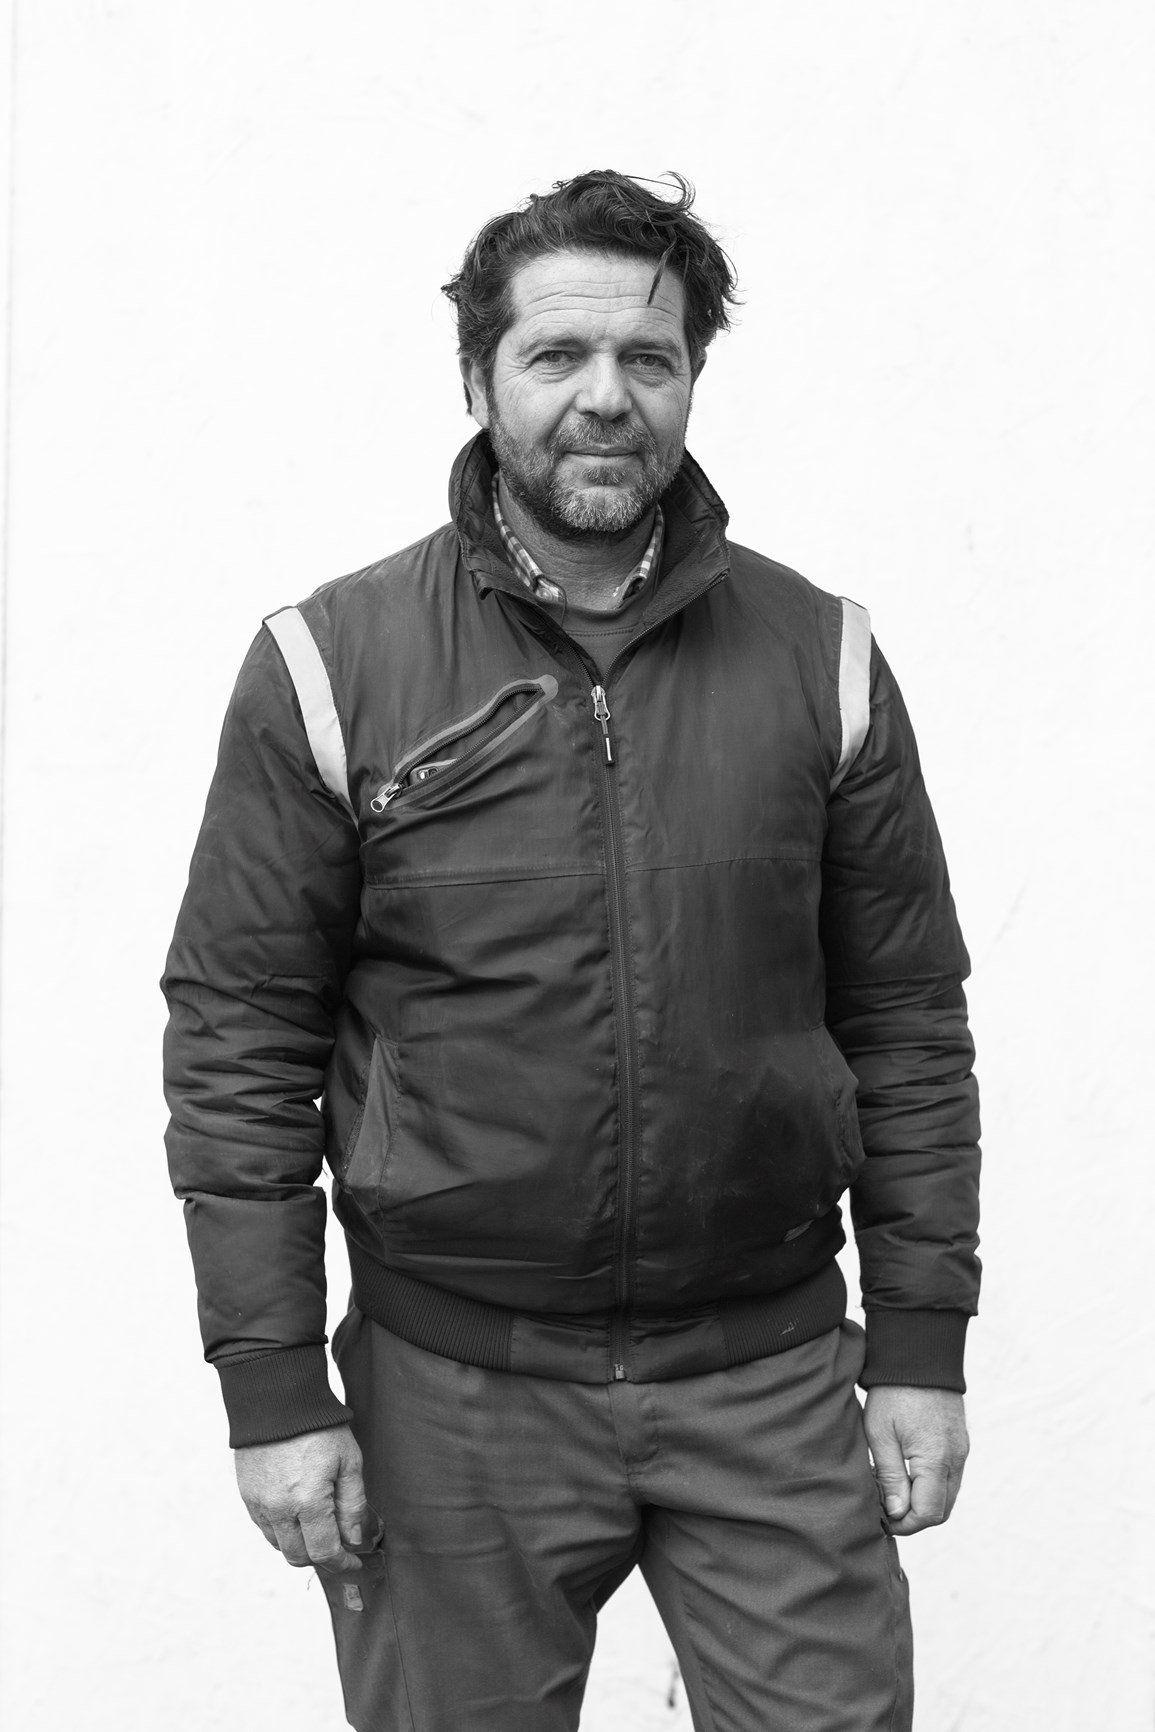 Marco Pelos Spagno, Realtà Manifeste, 2018